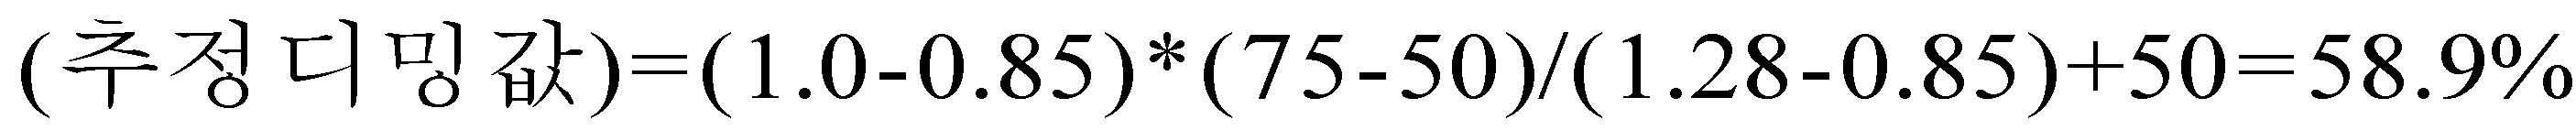 Figure 112015108802661-pat00001